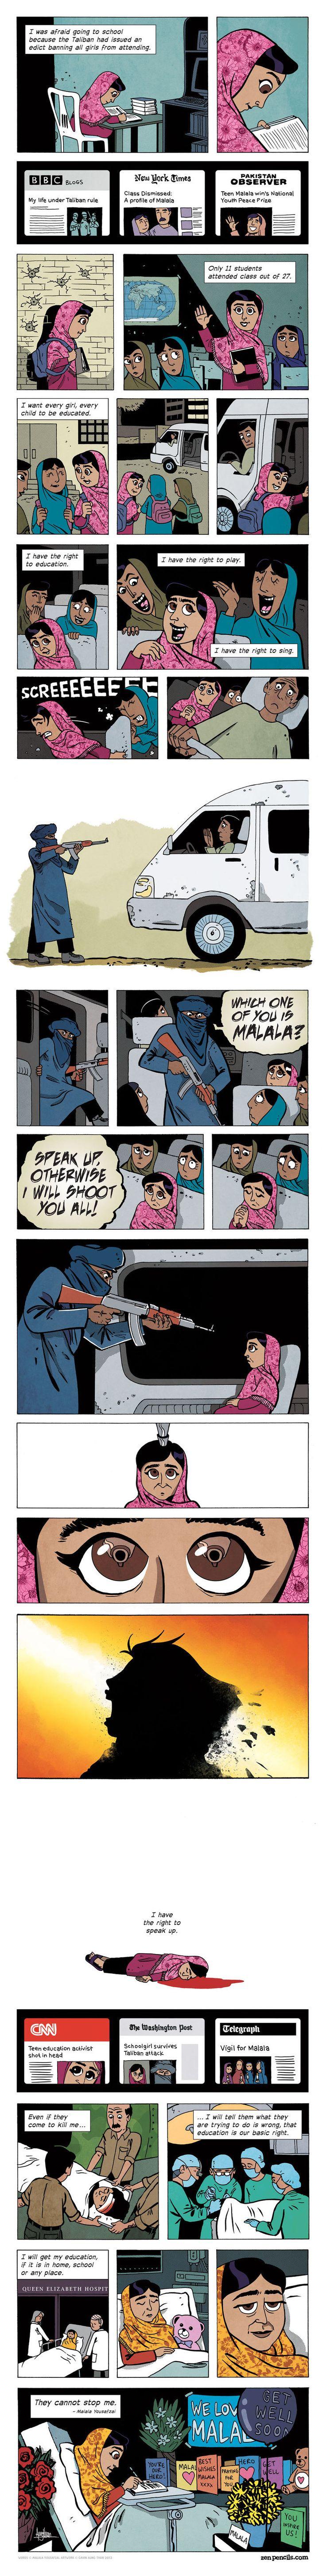 So beautiful. The words of Malala Yousafzai